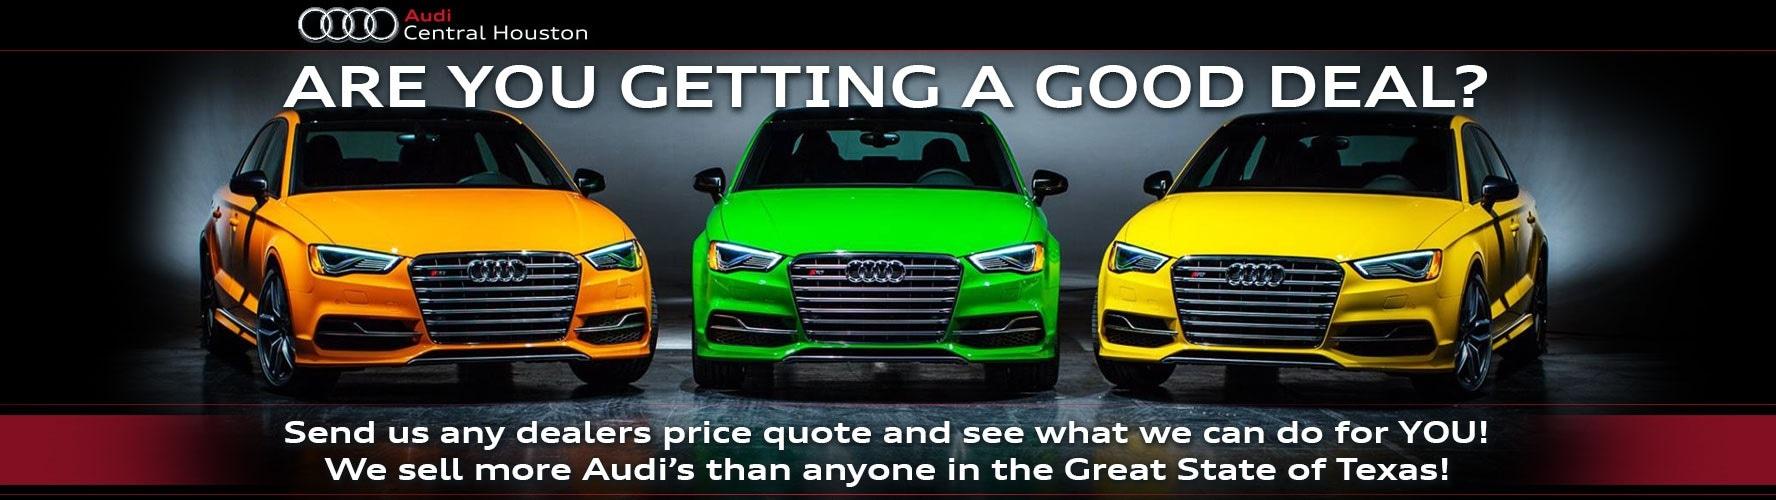 Audi central houston service specials 13